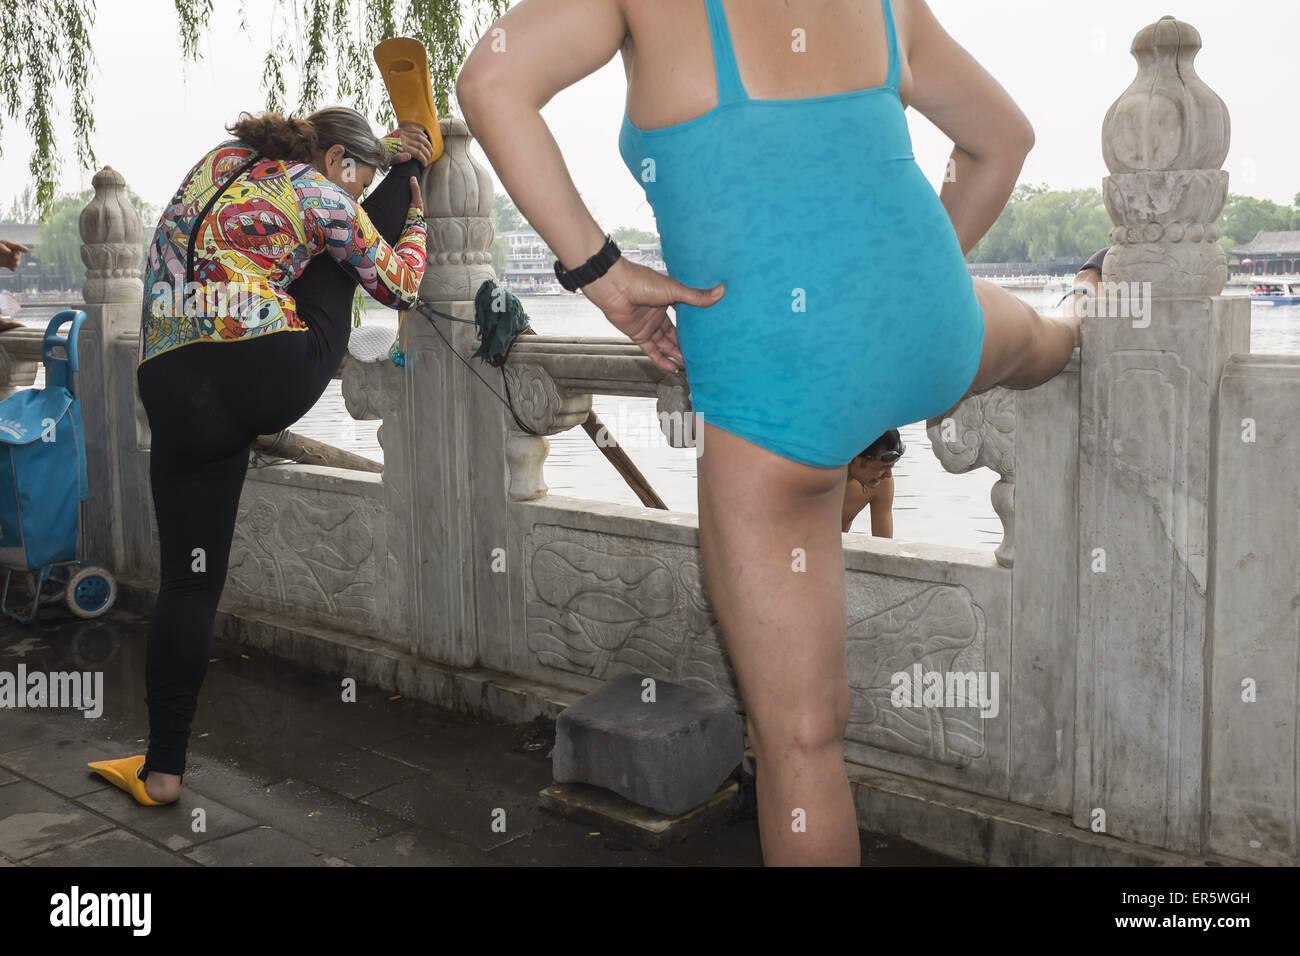 May 14, 2015 - Swimming at Shichahai, Beijing, China © Jiwei Han/ZUMA Wire/Alamy Live News Stock Photo